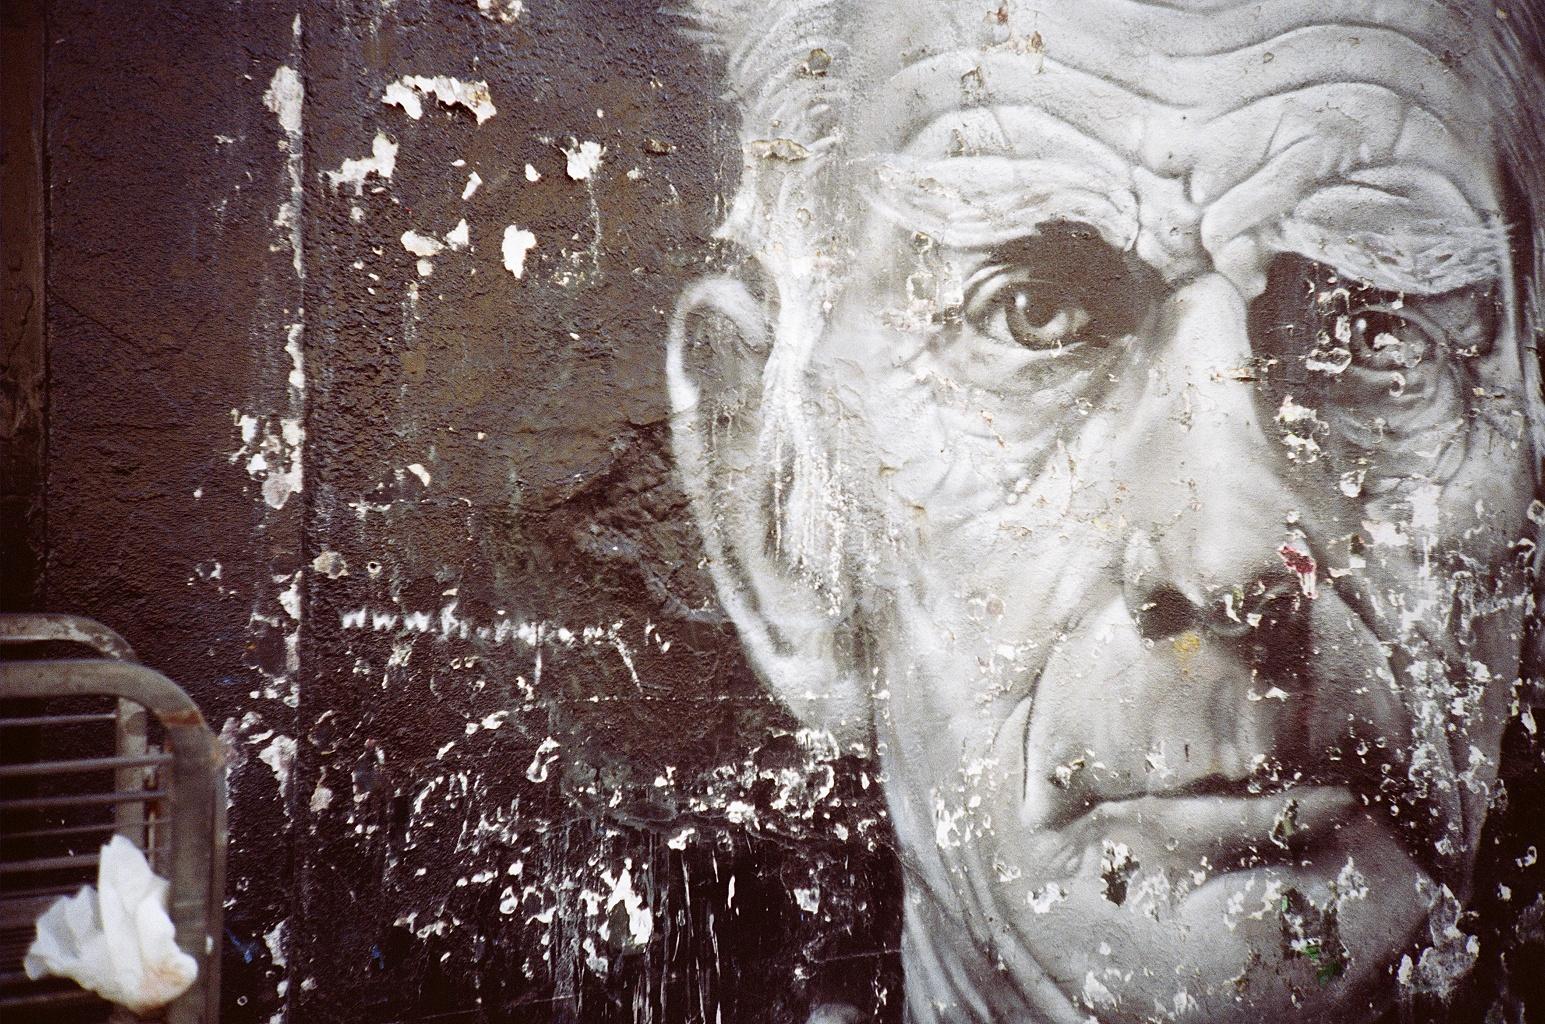 Samuel Beckett mural by Alex Martinez | Location: Notting Hill, London | Photo by Hind Mezaina